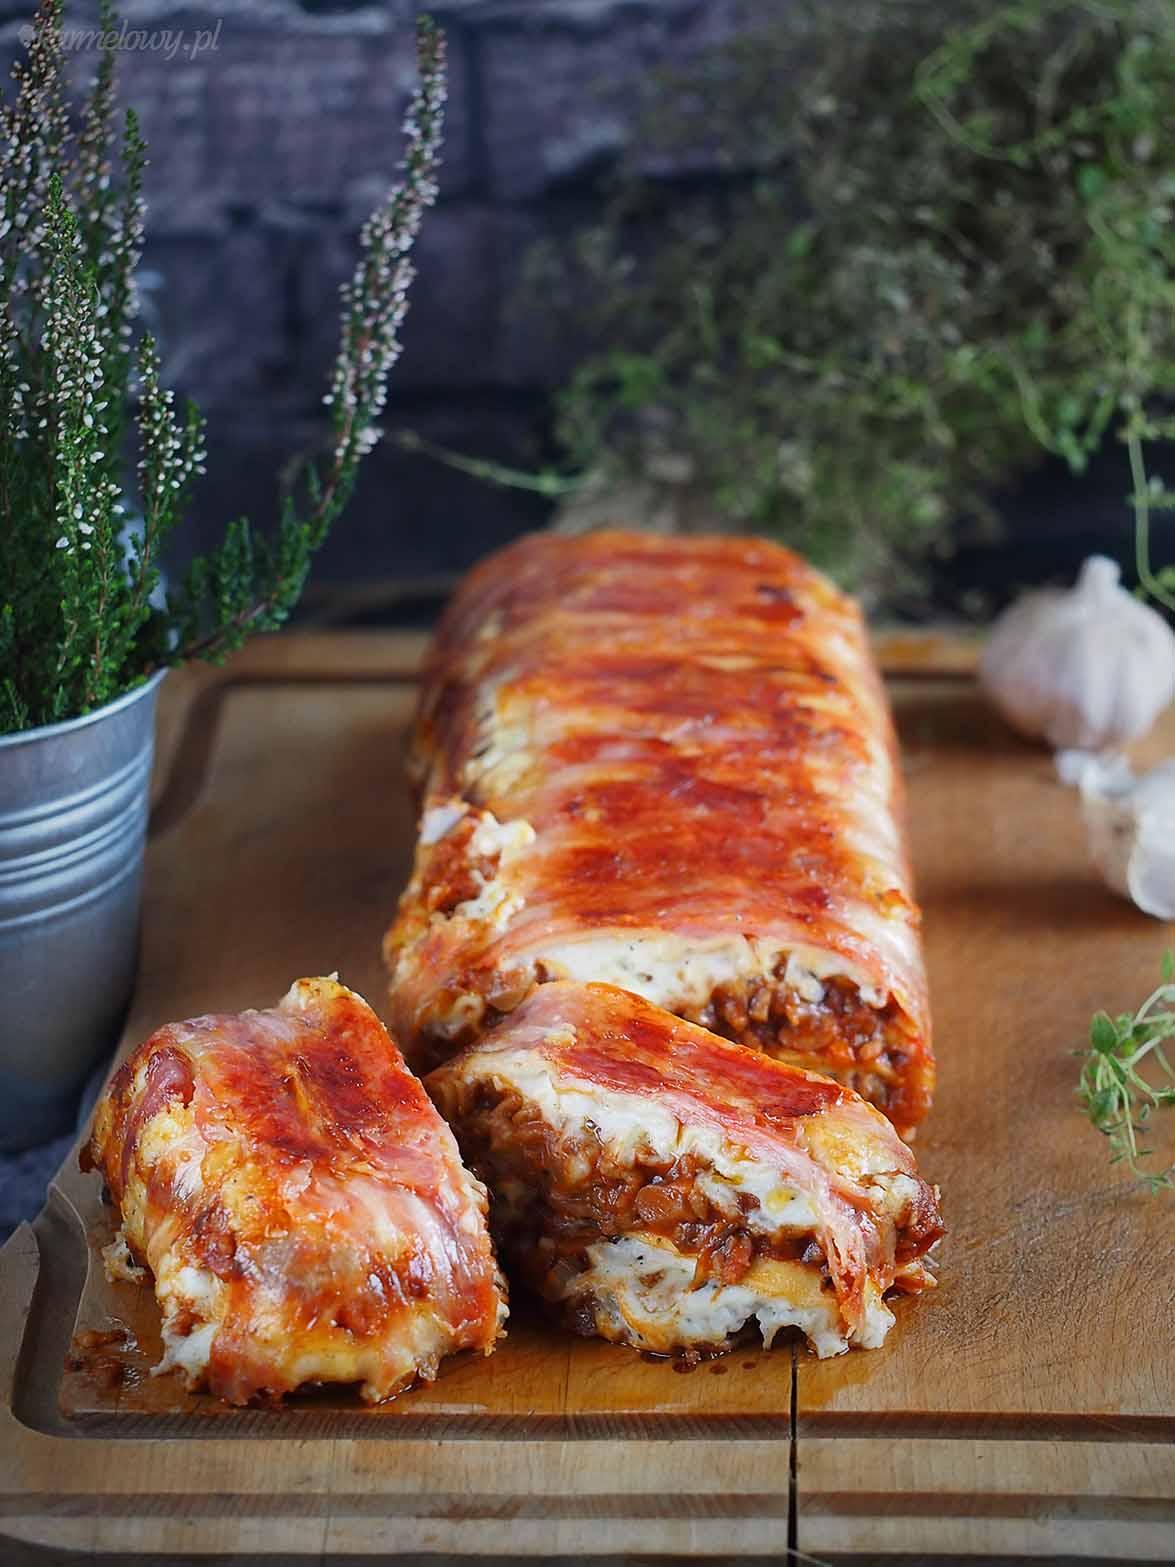 Lasagne-miesno-grzybowe-w-boczku-Bacon-wrapped-meat-and-mushroom-lasagna